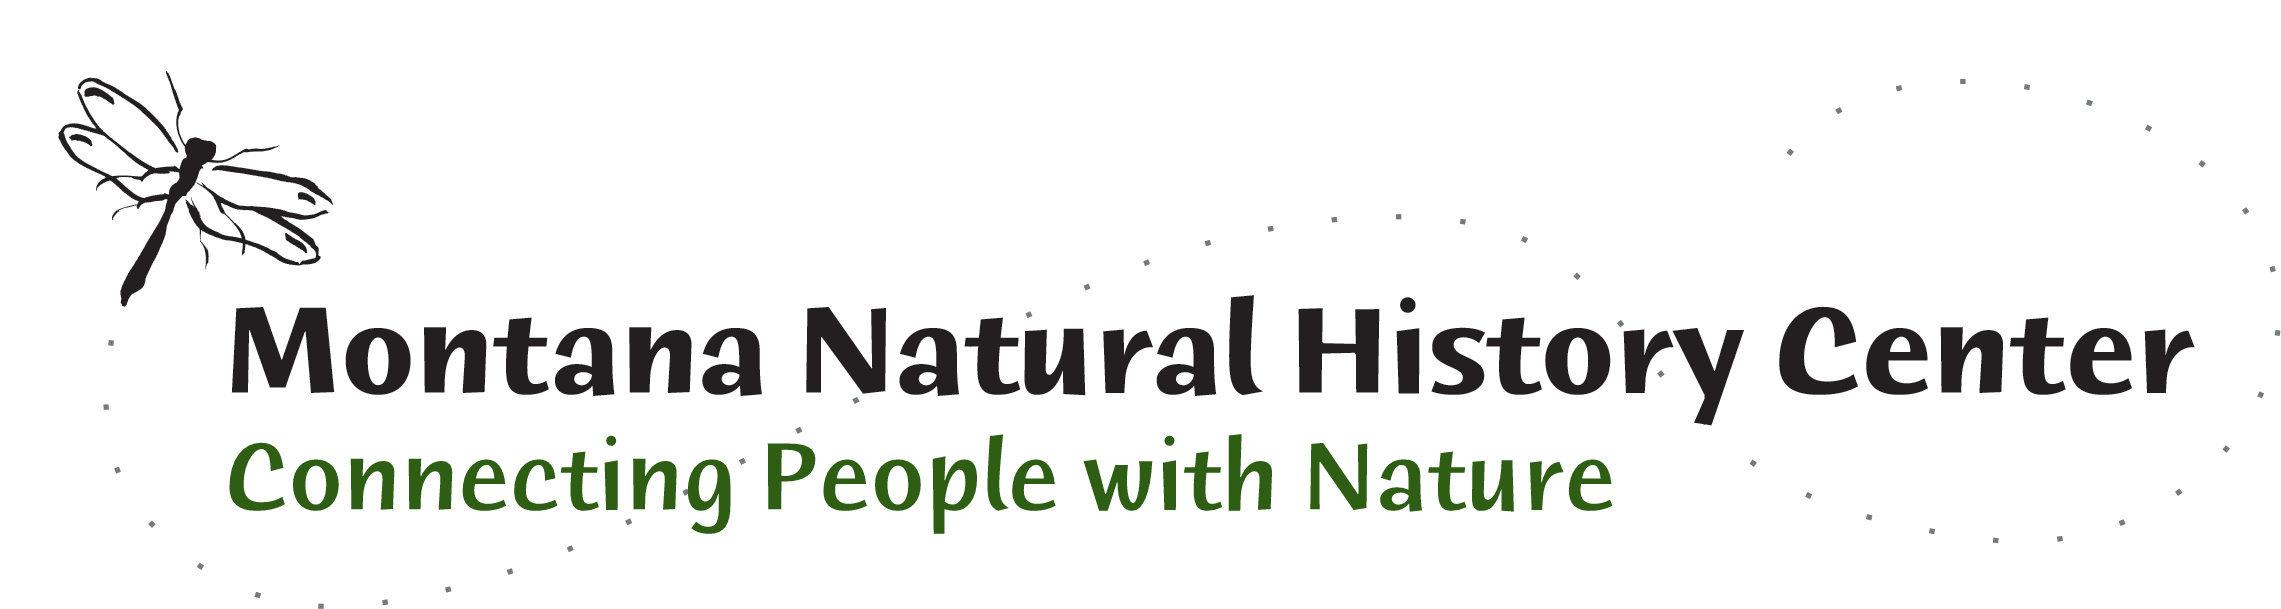 MNHC logo